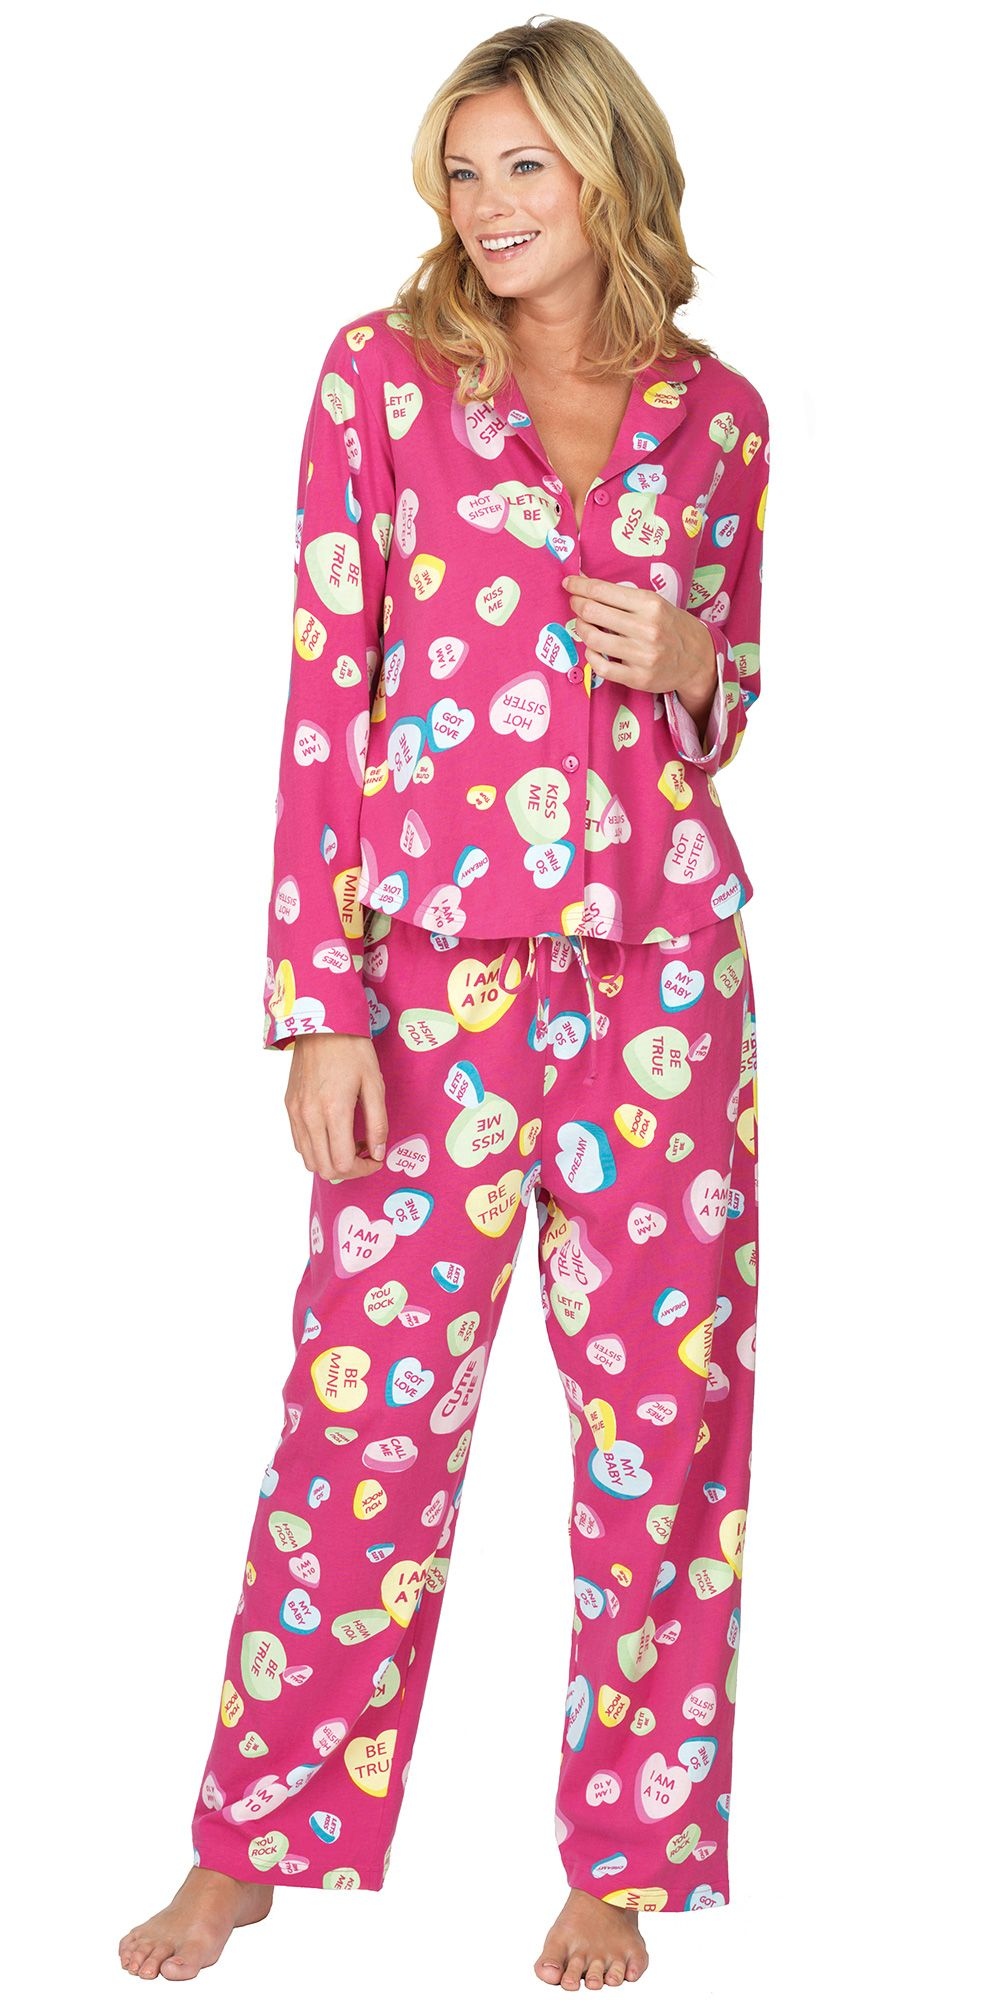 1b88bad055 Conversation Heart Boyfriend PJs - Valentine s Day Pajamas from PajamaGram.   59.99  ValentinesDay  Hearts  Pajamas